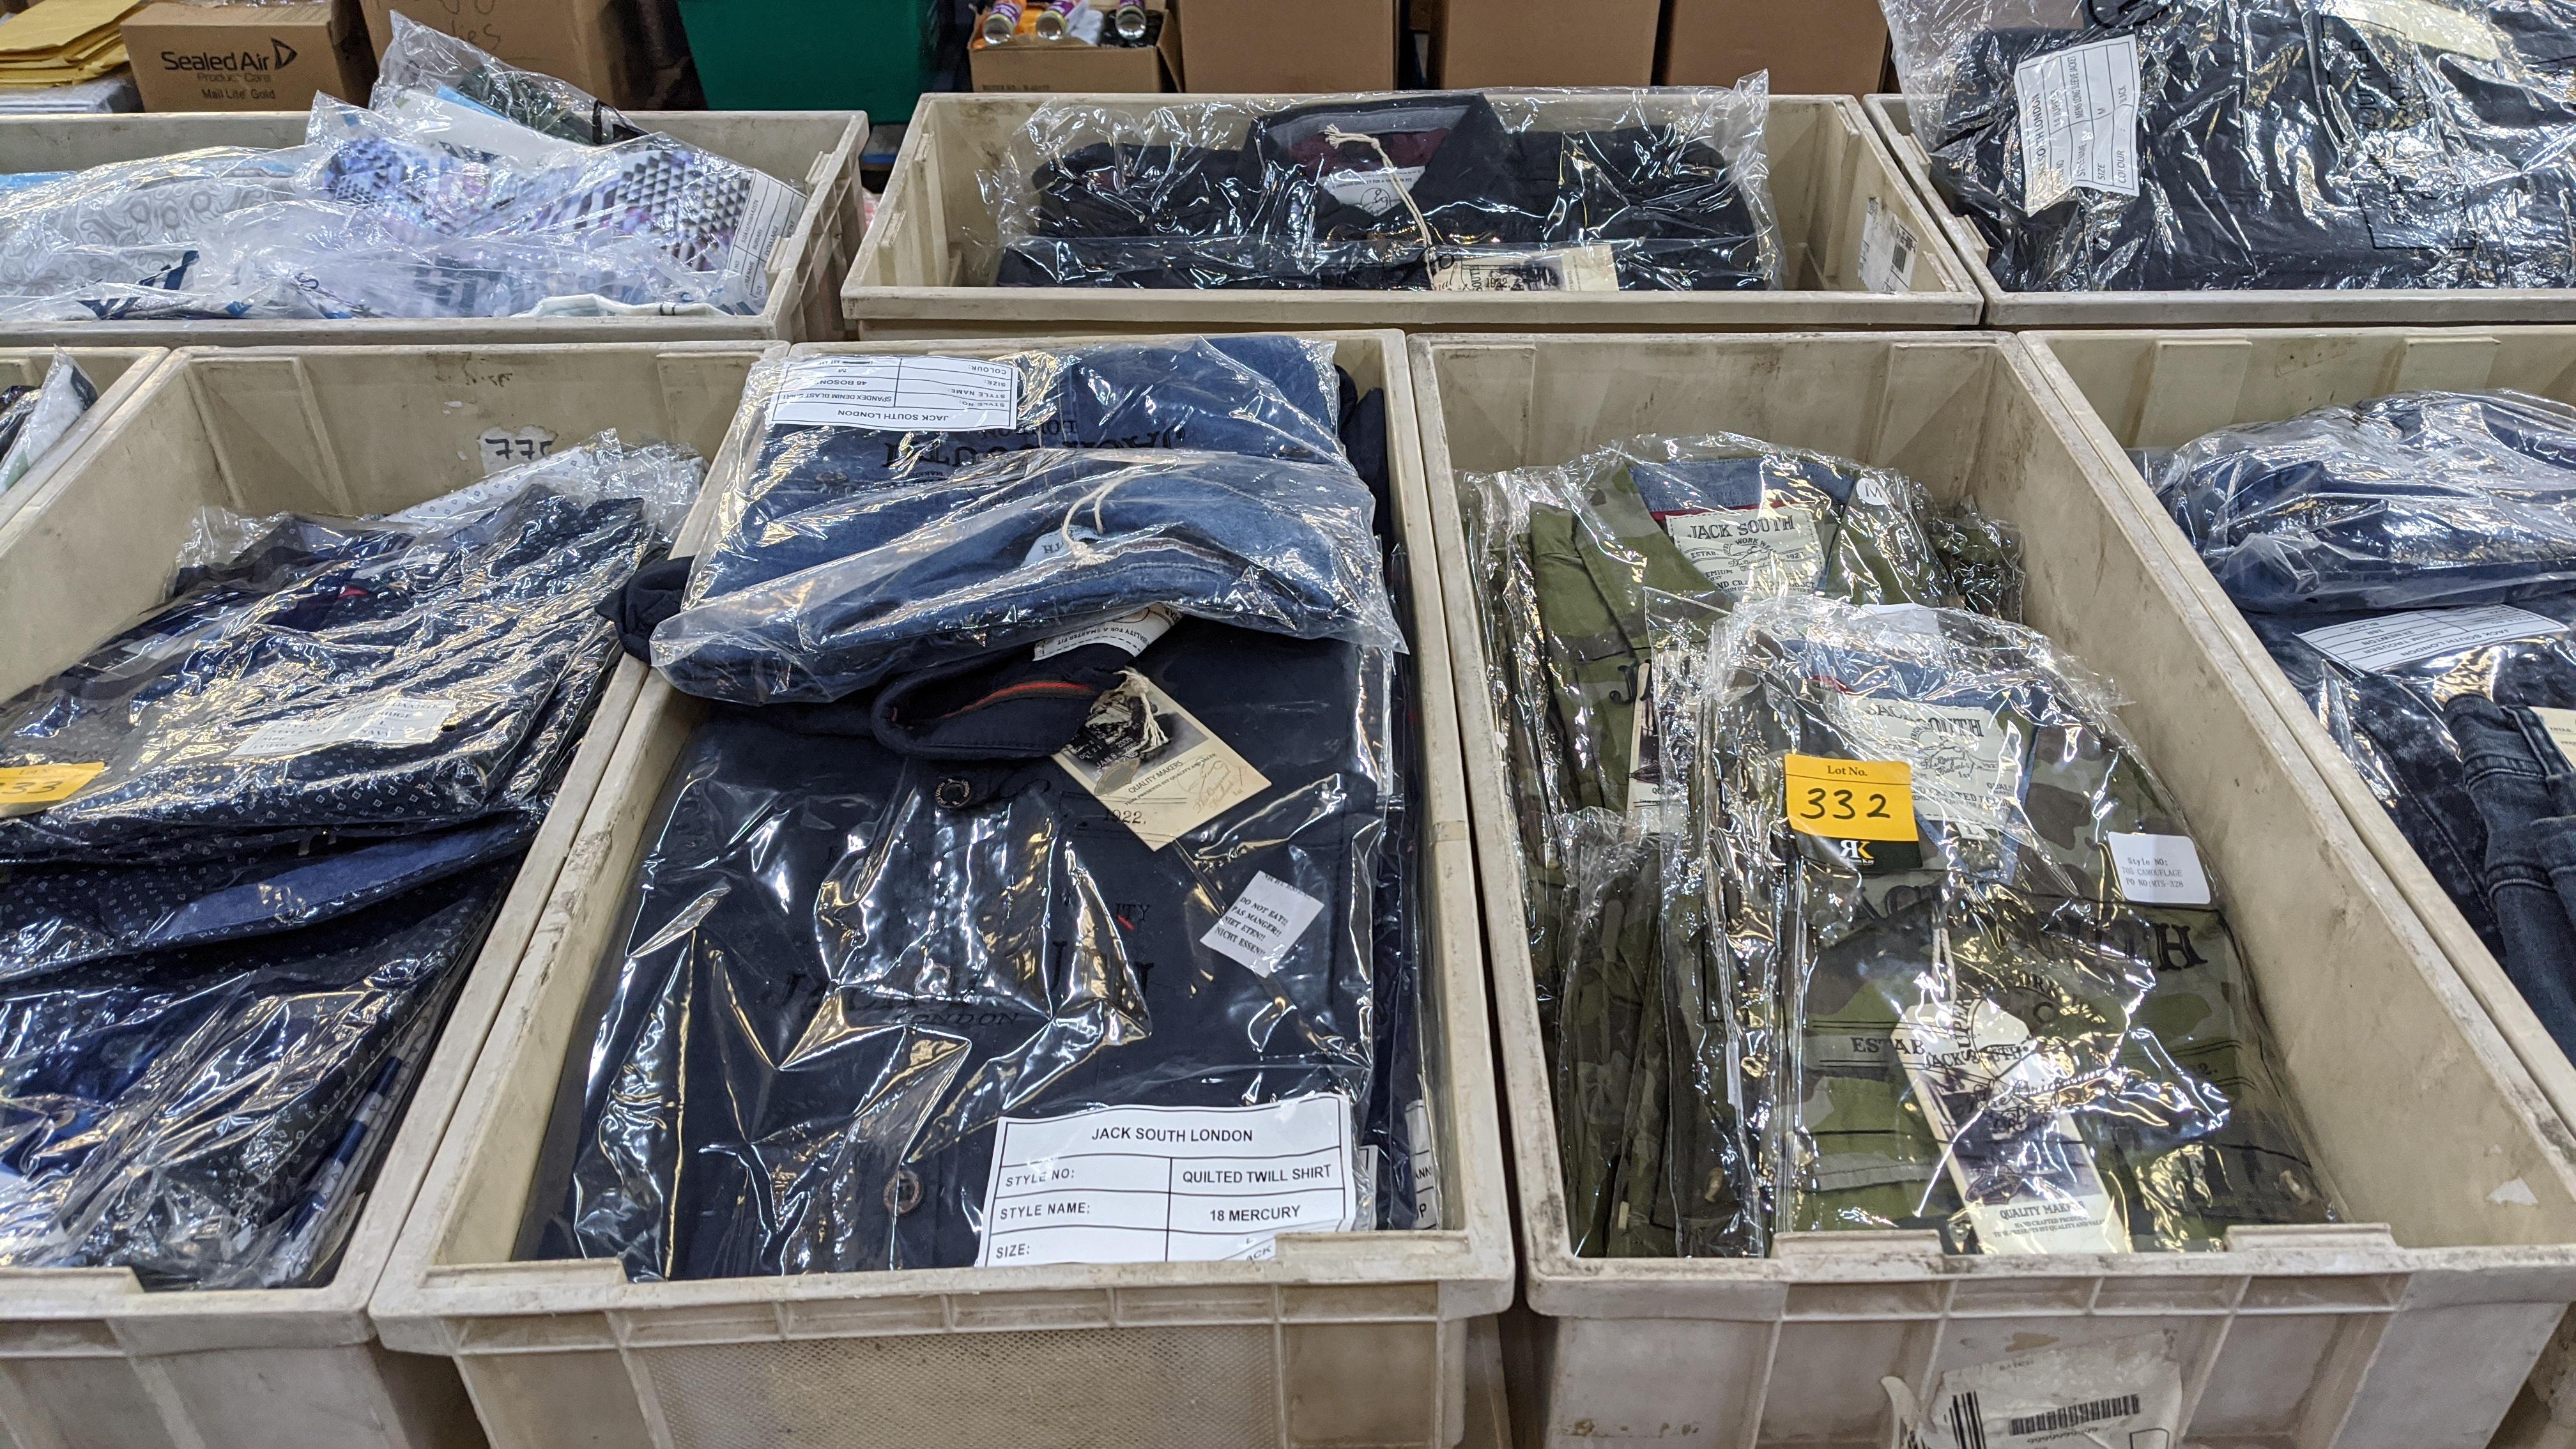 Very large quantity of primarily men's designer clothing & accessories. - Image 95 of 157